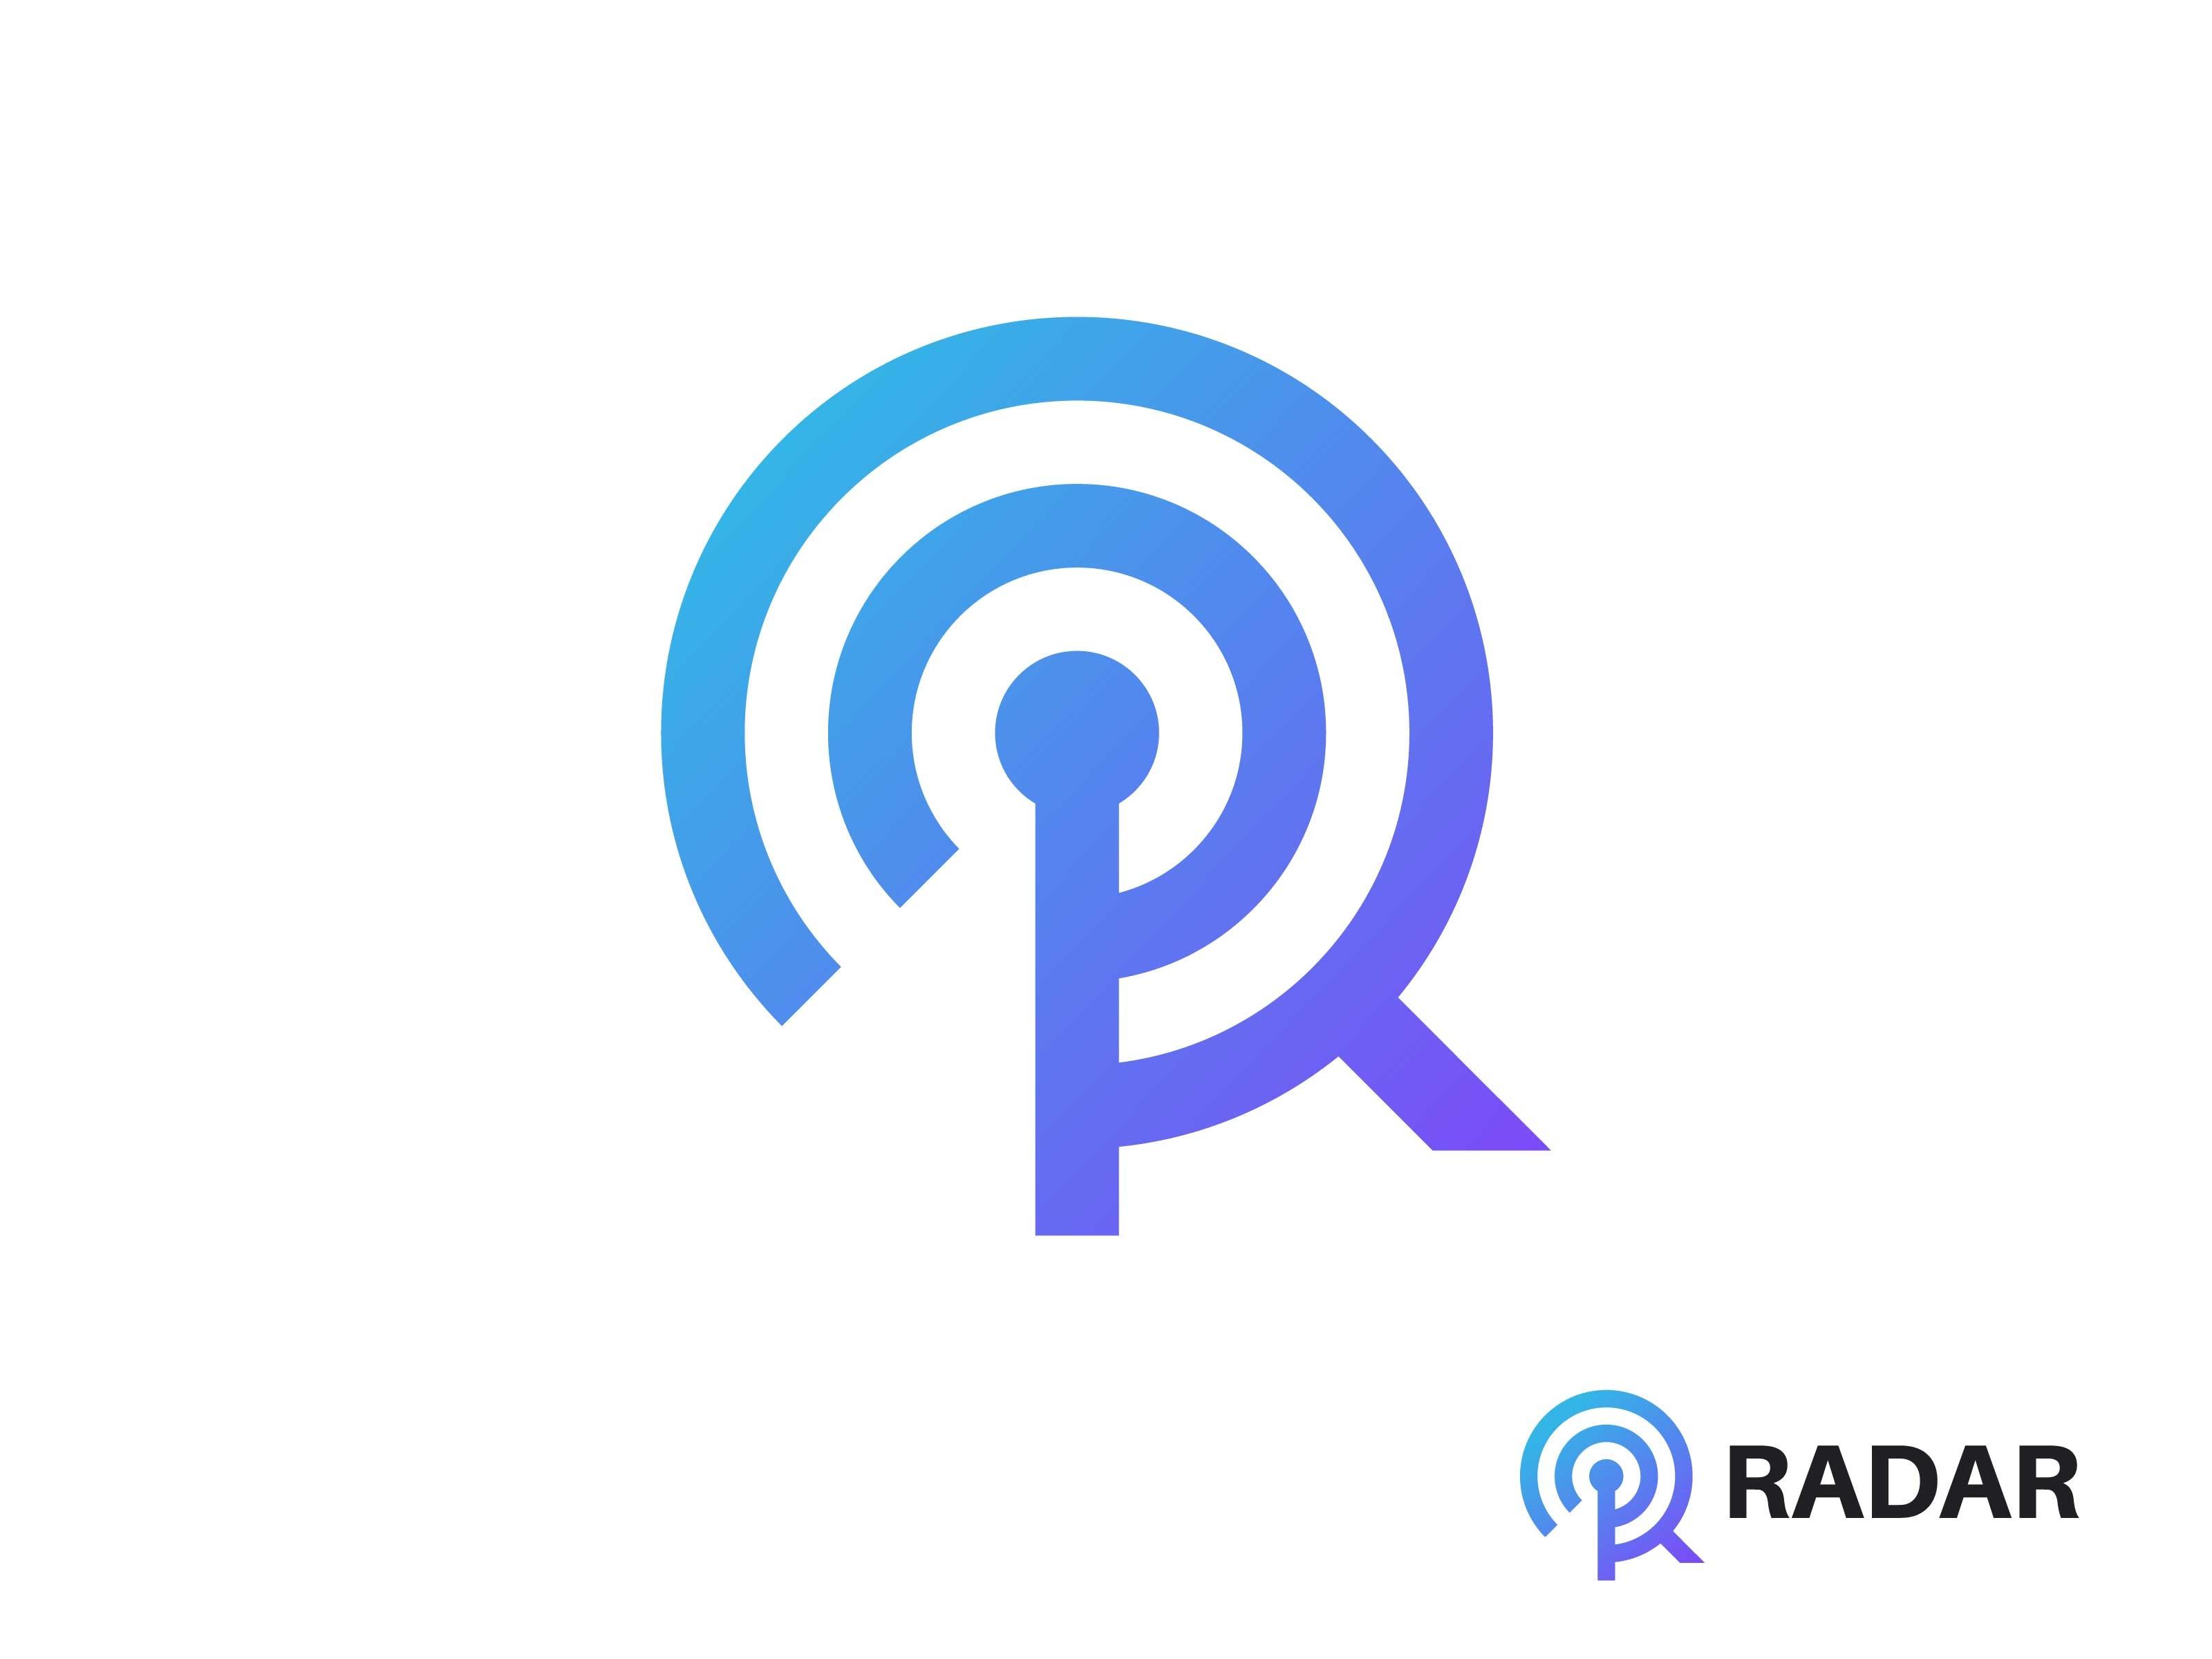 Radar Logo Design by RubenDaems.